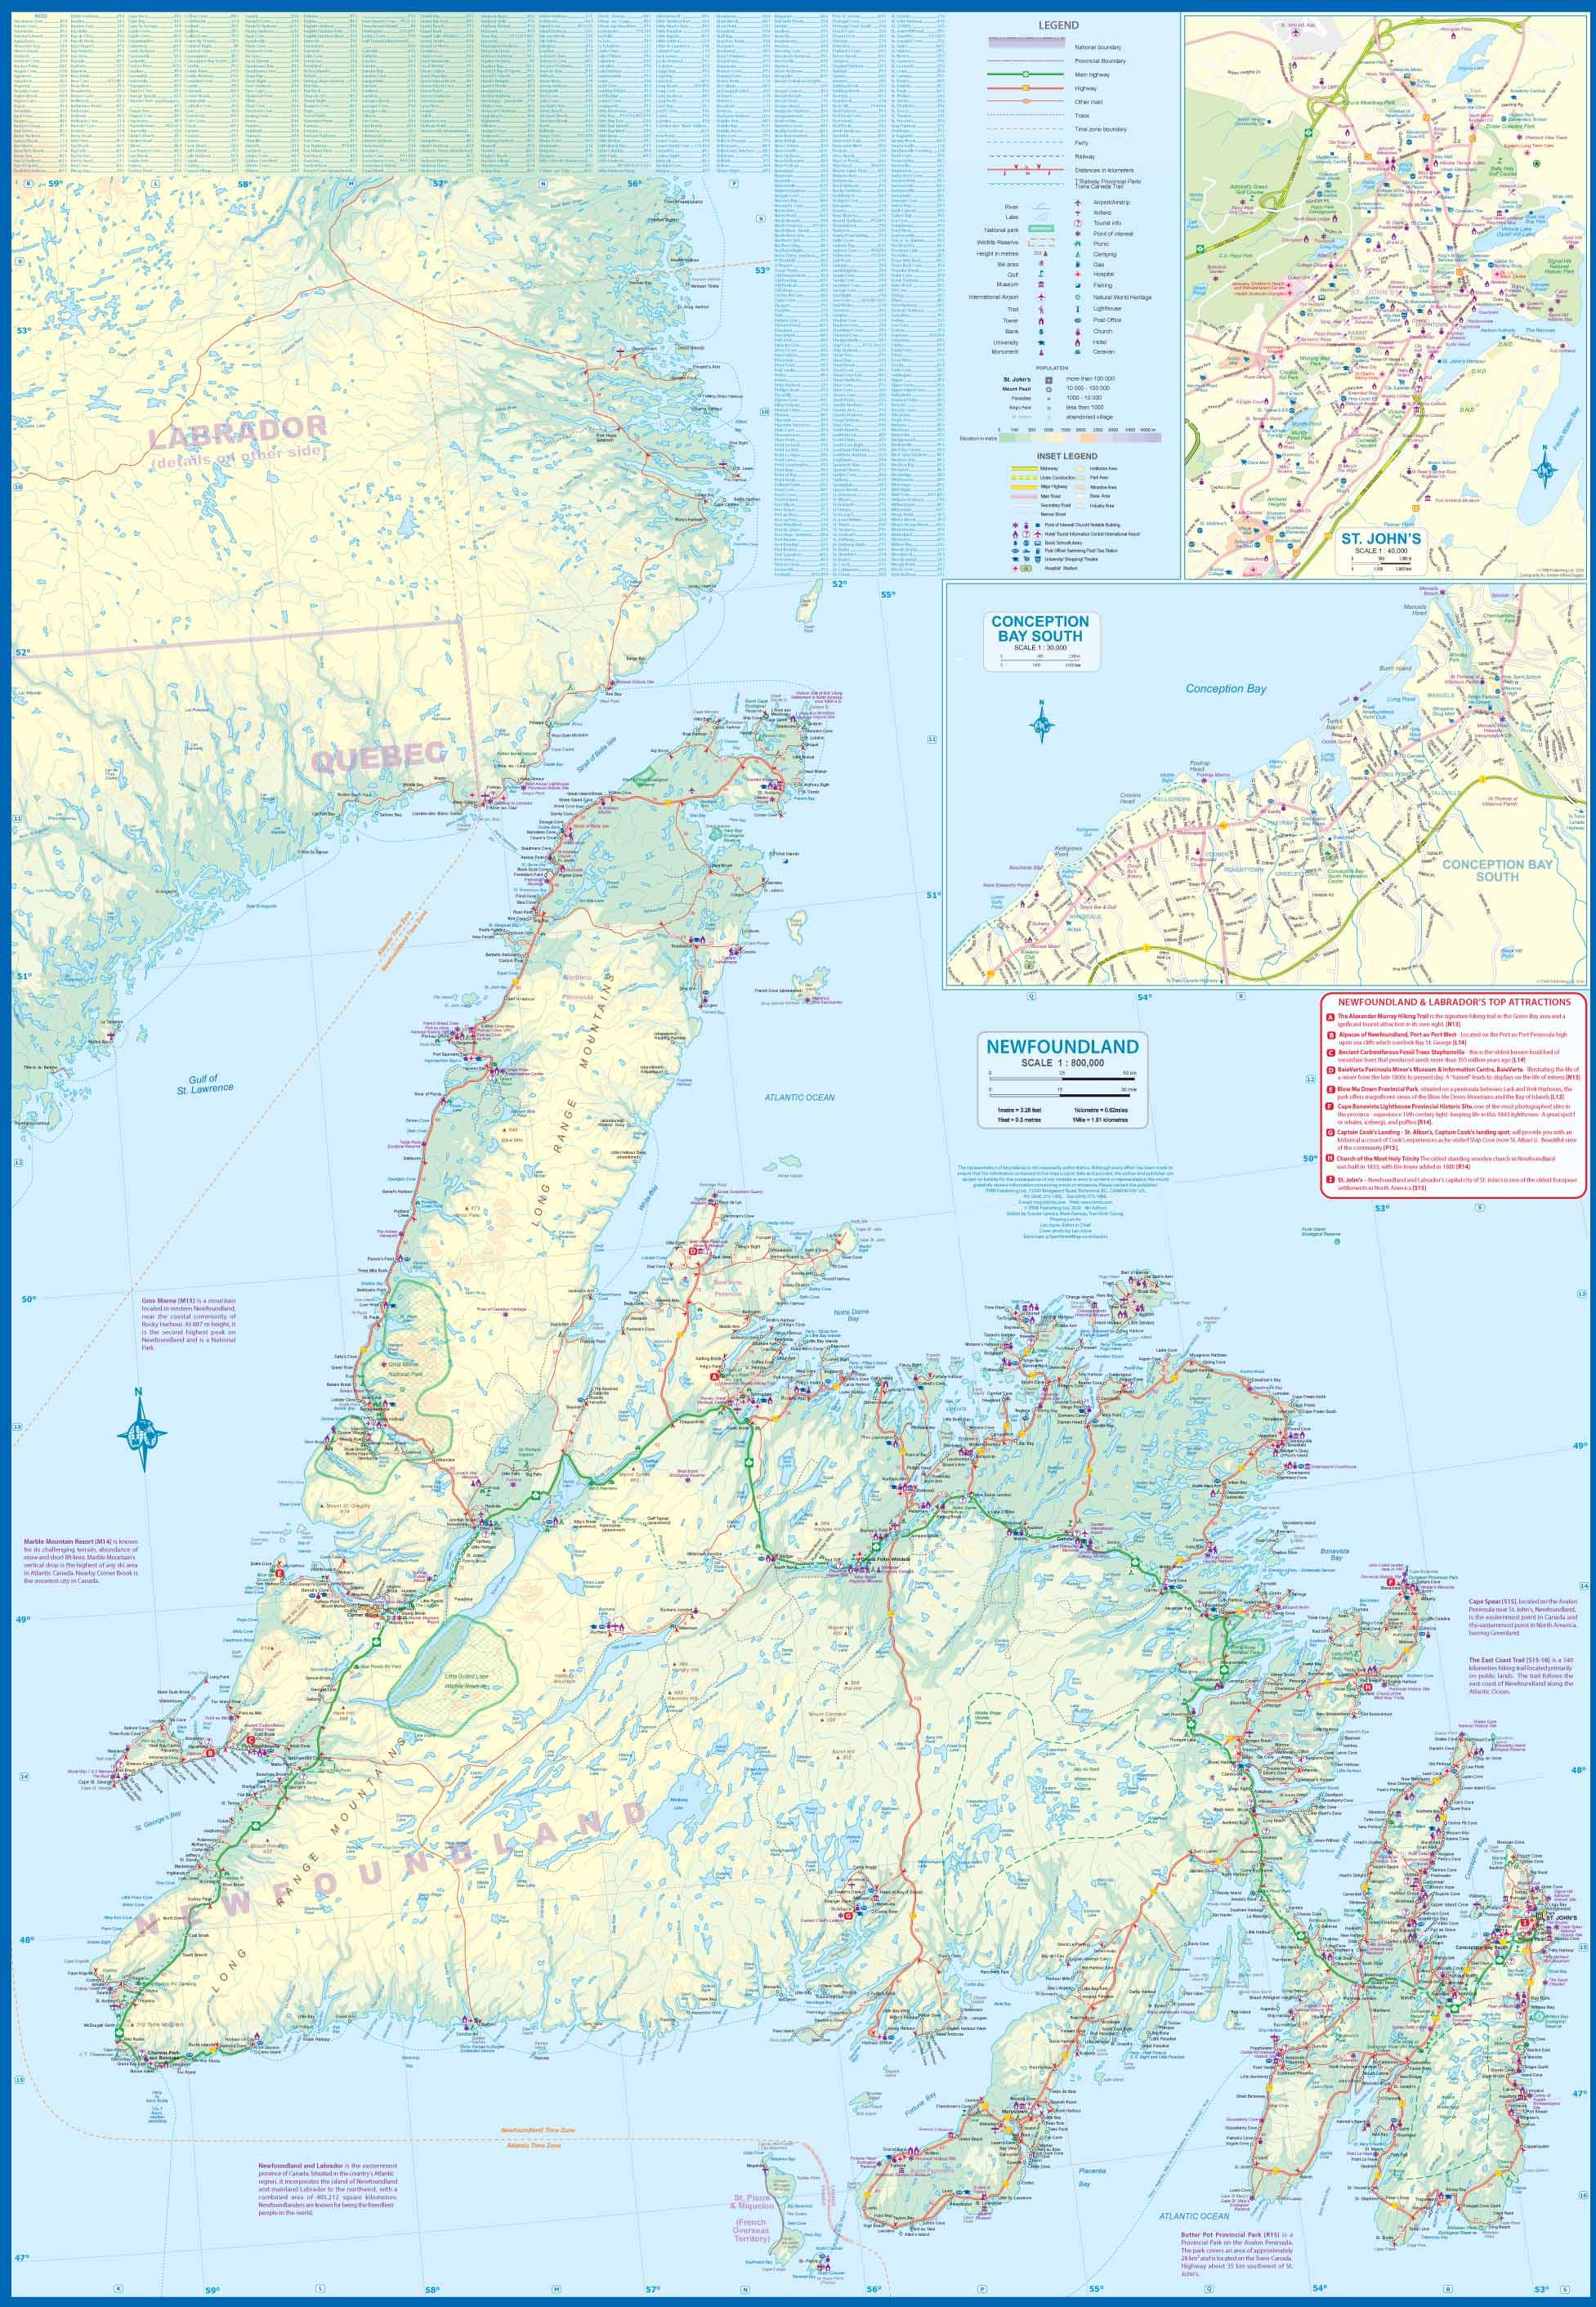 Maps for travel, City Maps, Road Maps, Guides, Globes, Topographic Newfoundland Map on canada map, laurentian mountains map, nova scotia map, alberta map, new brunswick map, yucatan peninsula map, quebec map, europe map, hispaniola map, hudson bay map, iceland map, manitoba map, bahamas map, avalon peninsula map, new mexico map, british columbia map, north america map, world map, labrador map, greenland map,